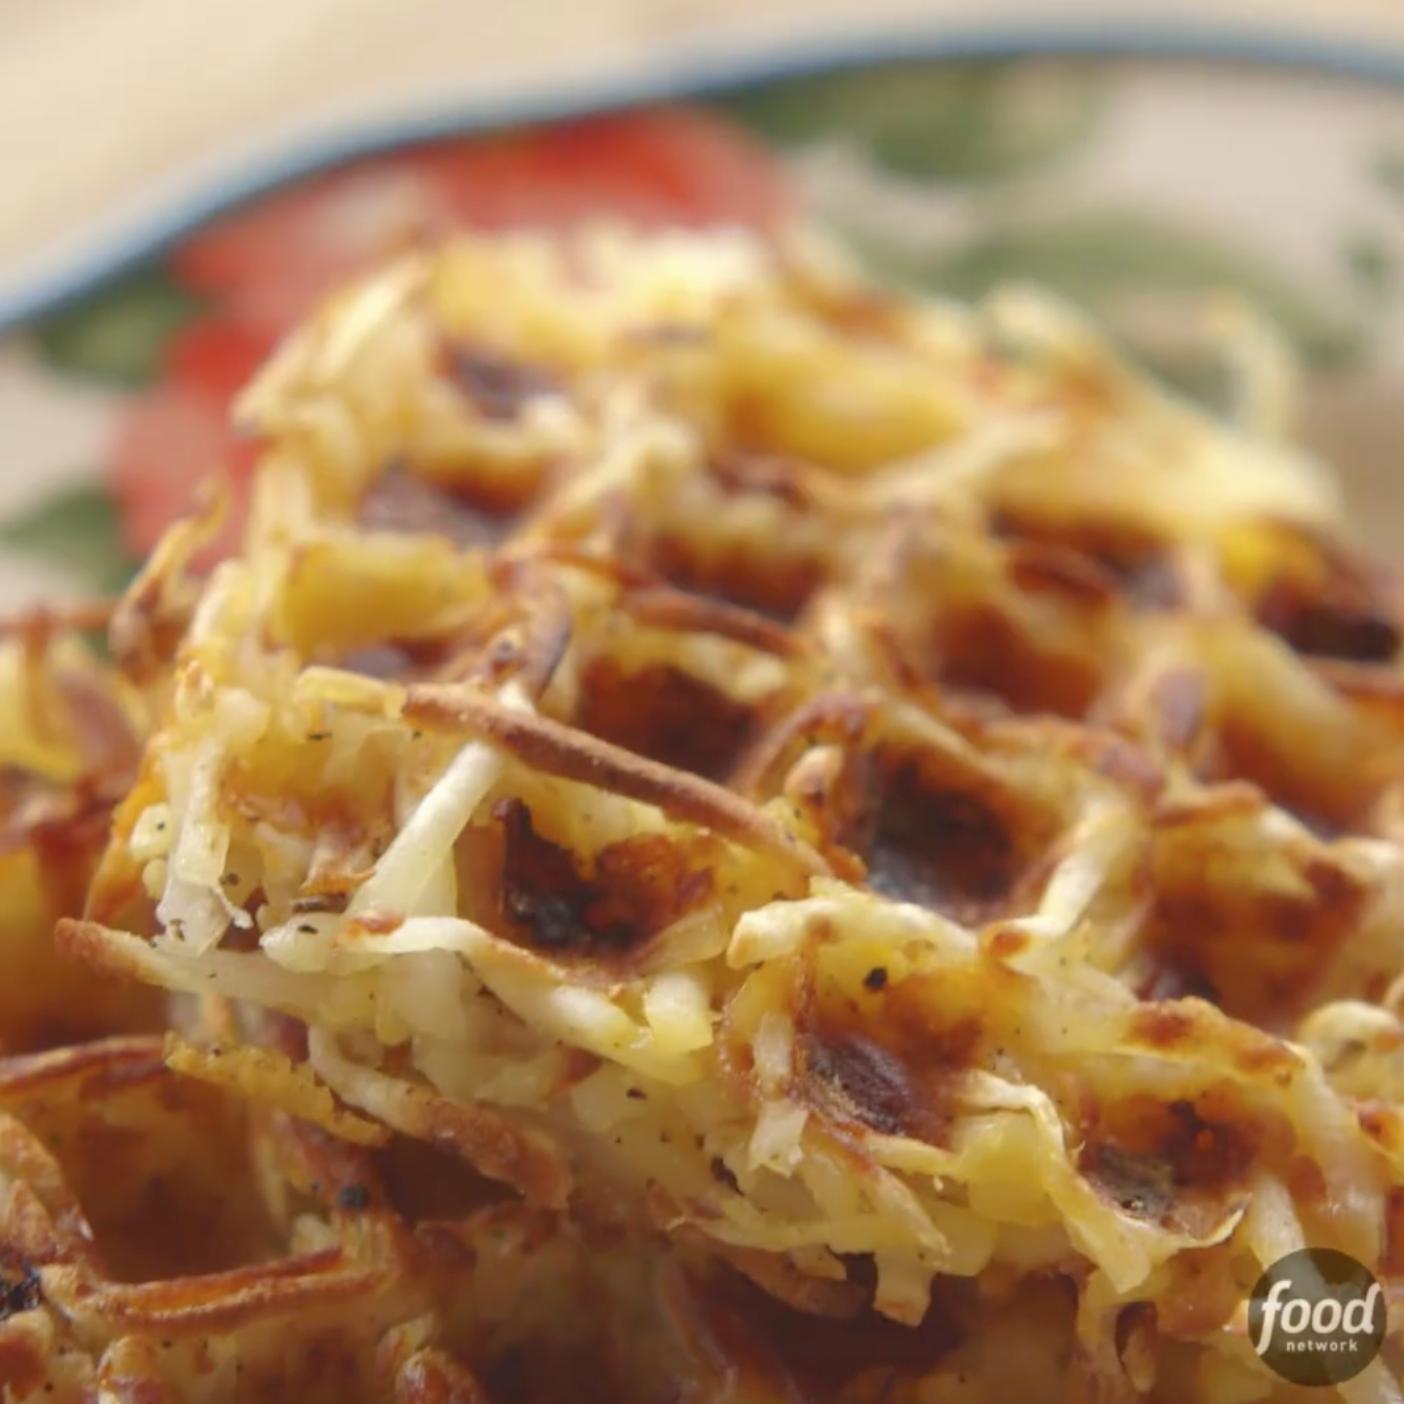 Wafflemaker Hash Browns Recipe In 2019 Food Network' Top 100 Videos Waffles Breakfast